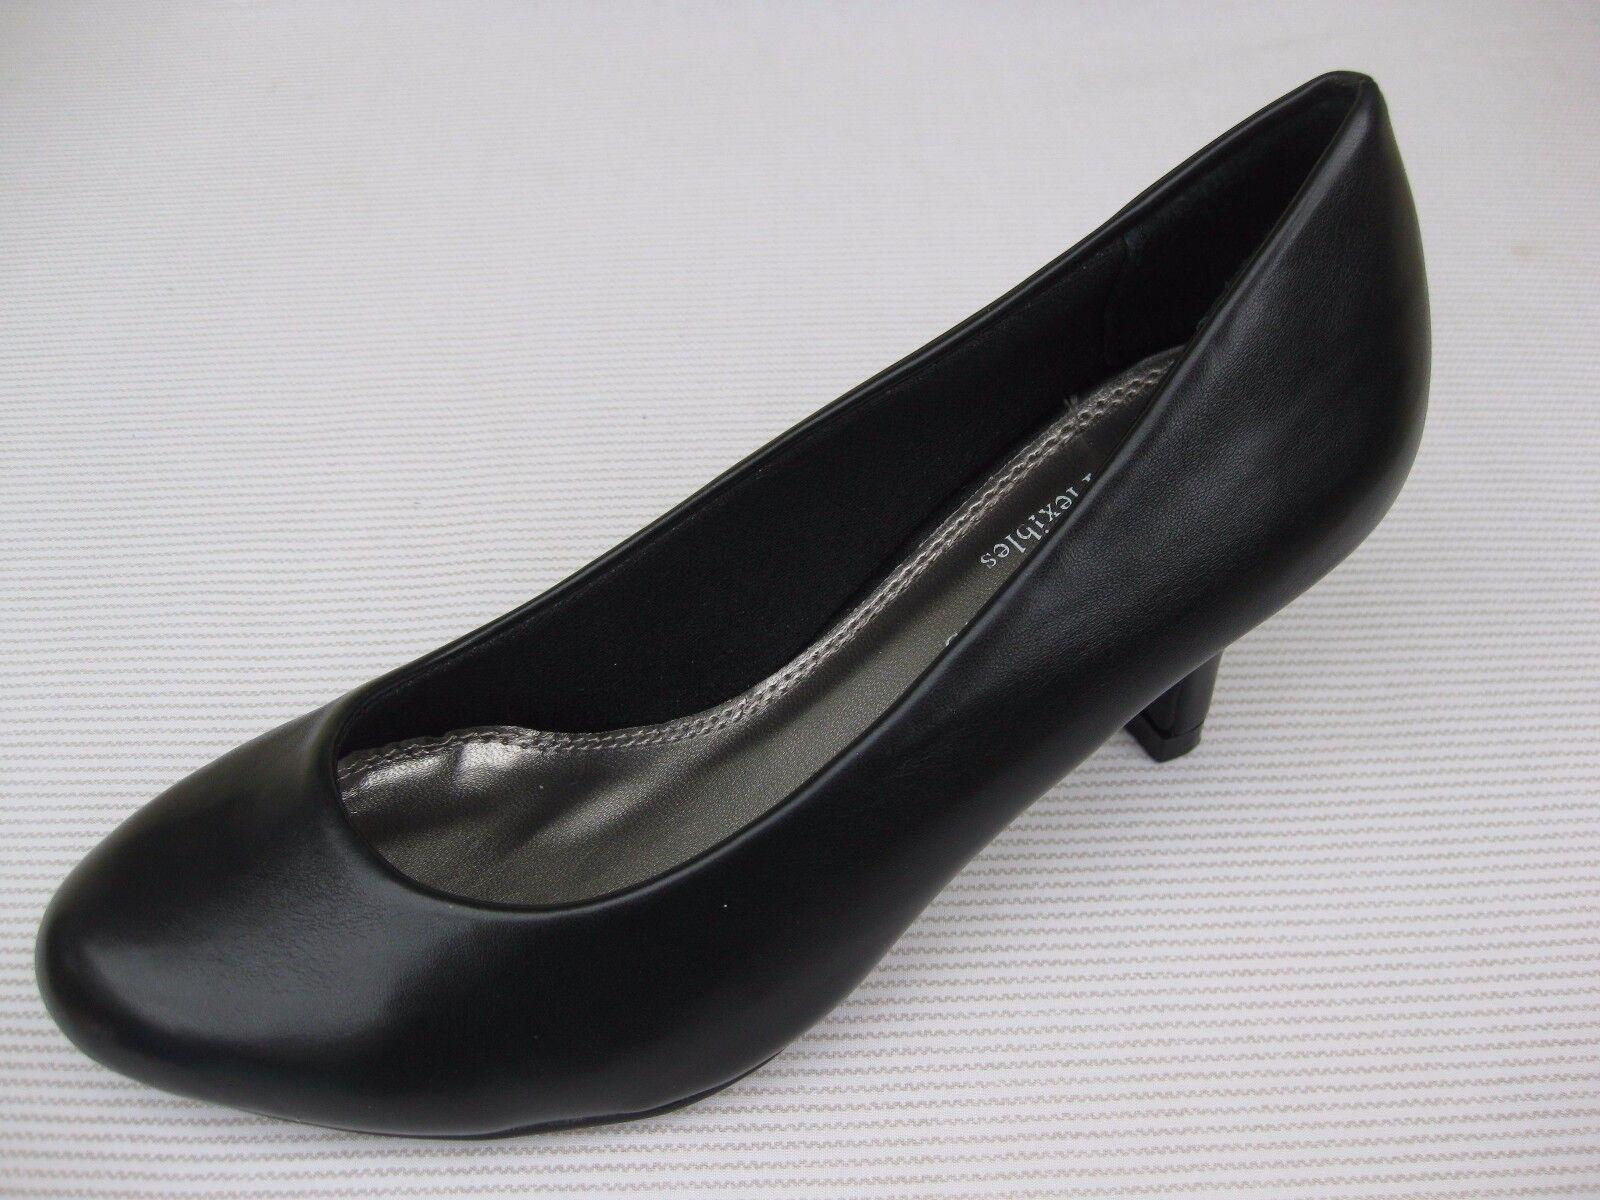 Pierre NEW Dumas Flexibles Womens Shoes NEW Pierre $44 Lola Black Smooth Pump 10 M dfff5b